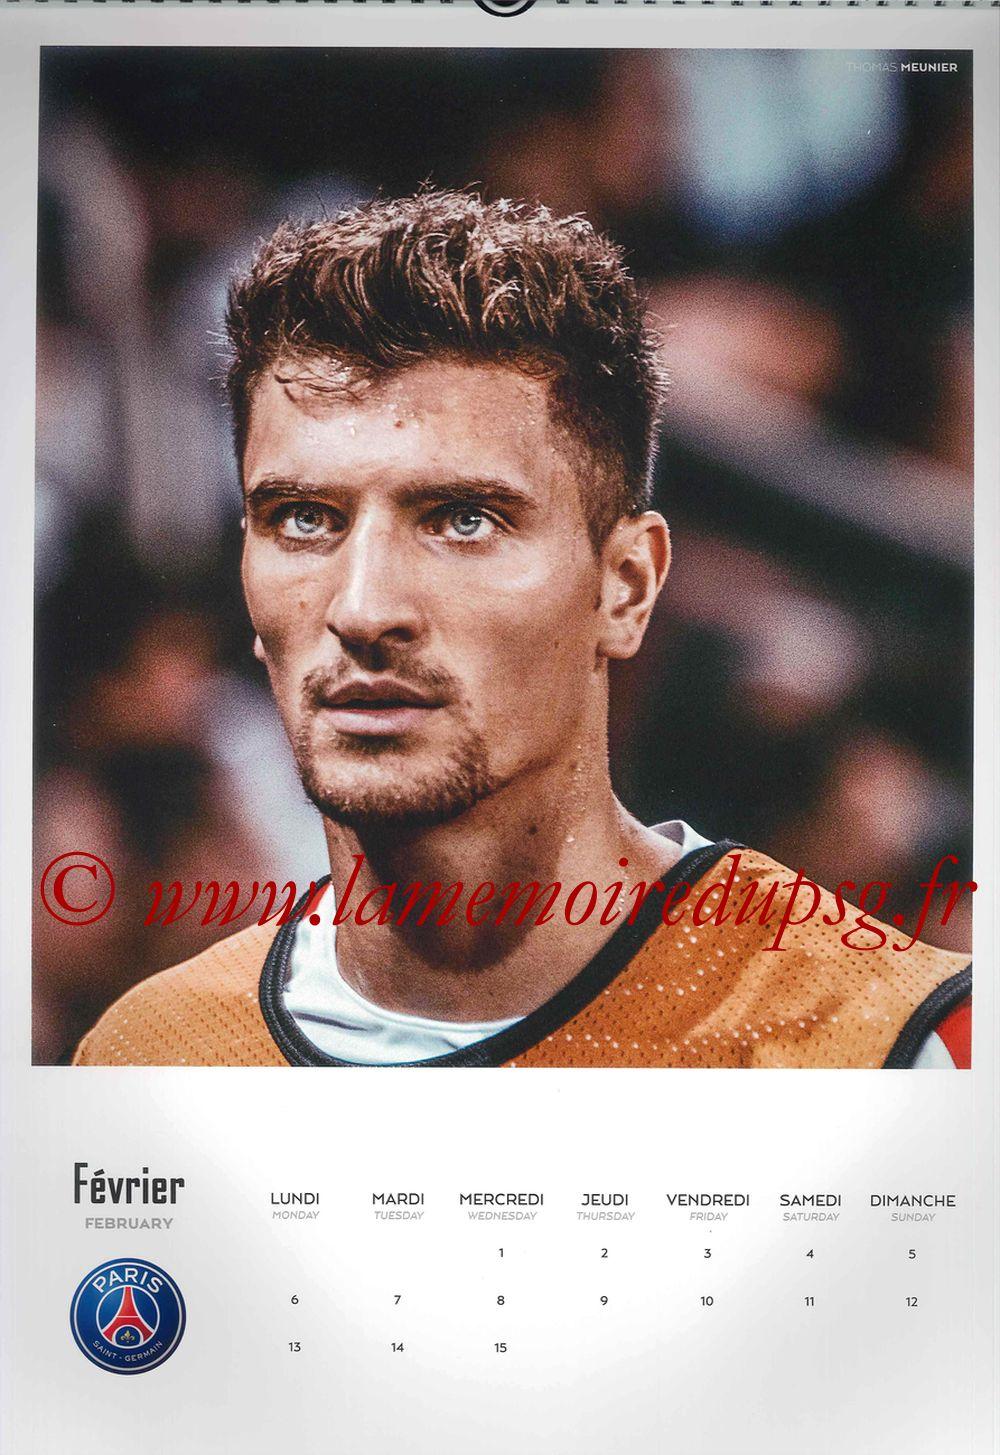 Calendrier PSG 2017 - Page 03 - Thomas MEUNIER